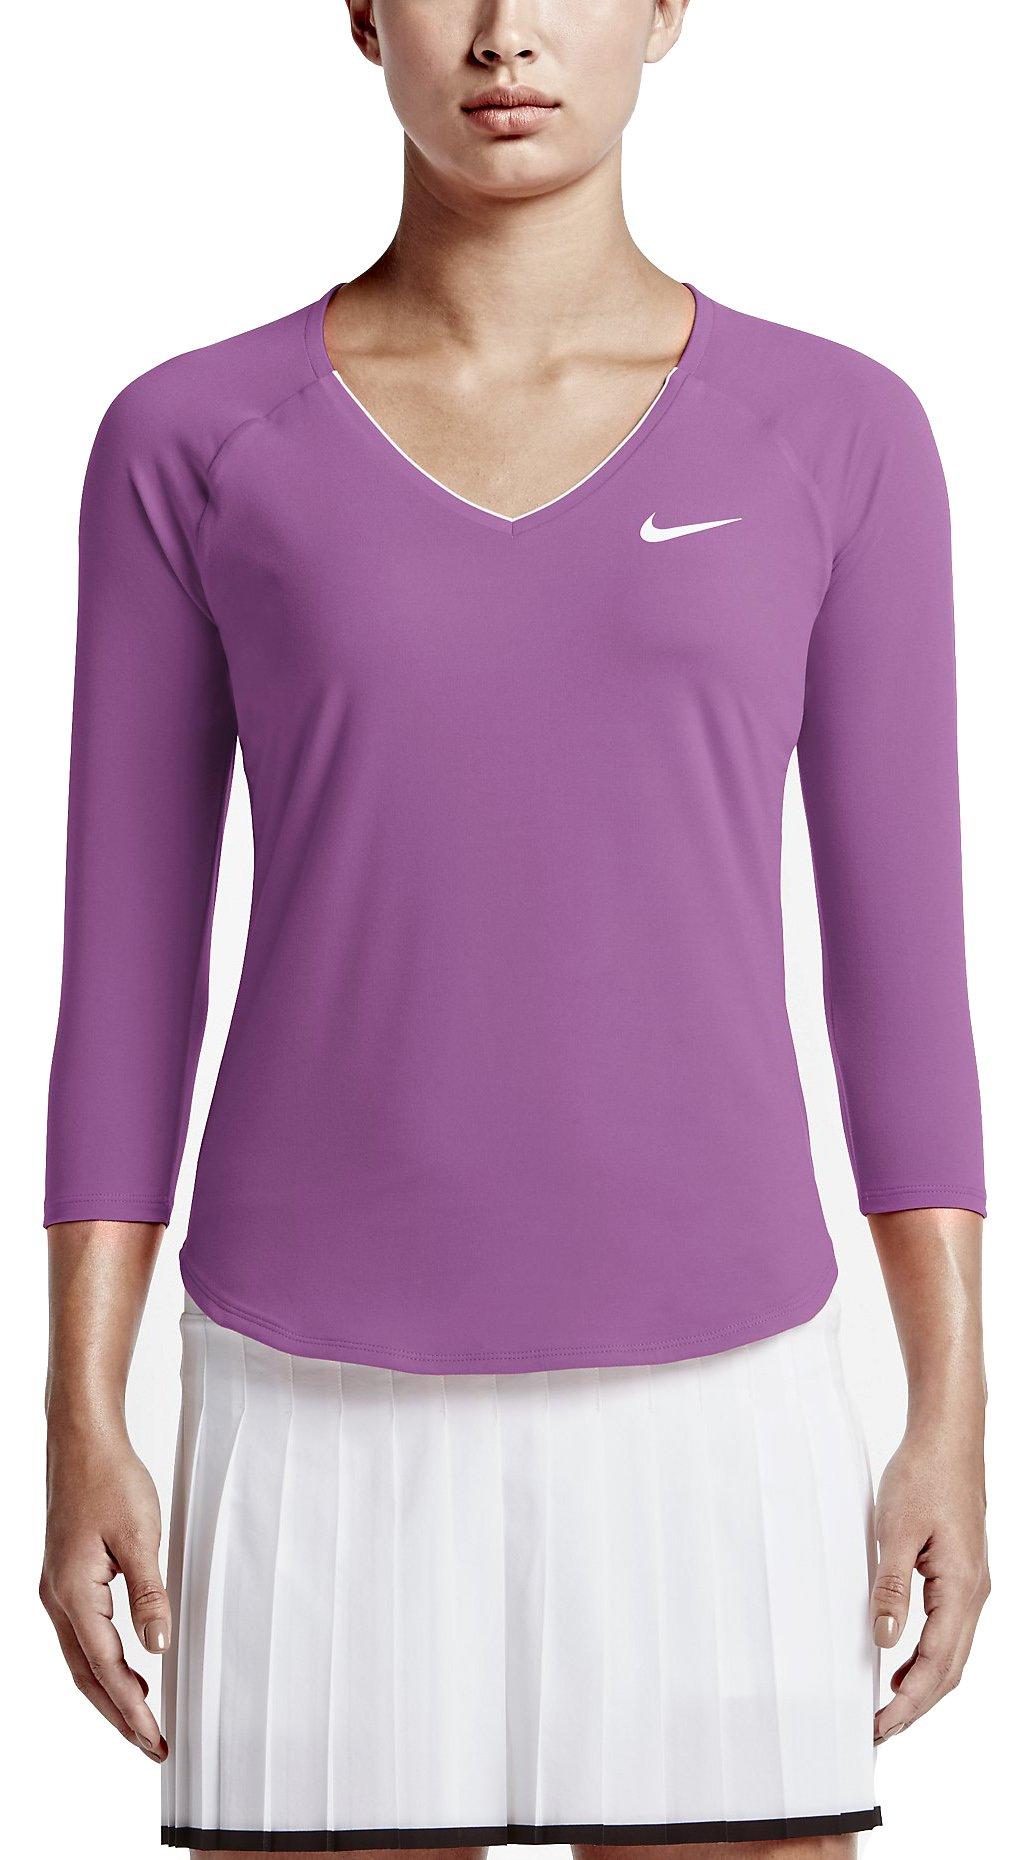 584628bdfaae Dámské tričko s krátkým rukávem Nike Pure